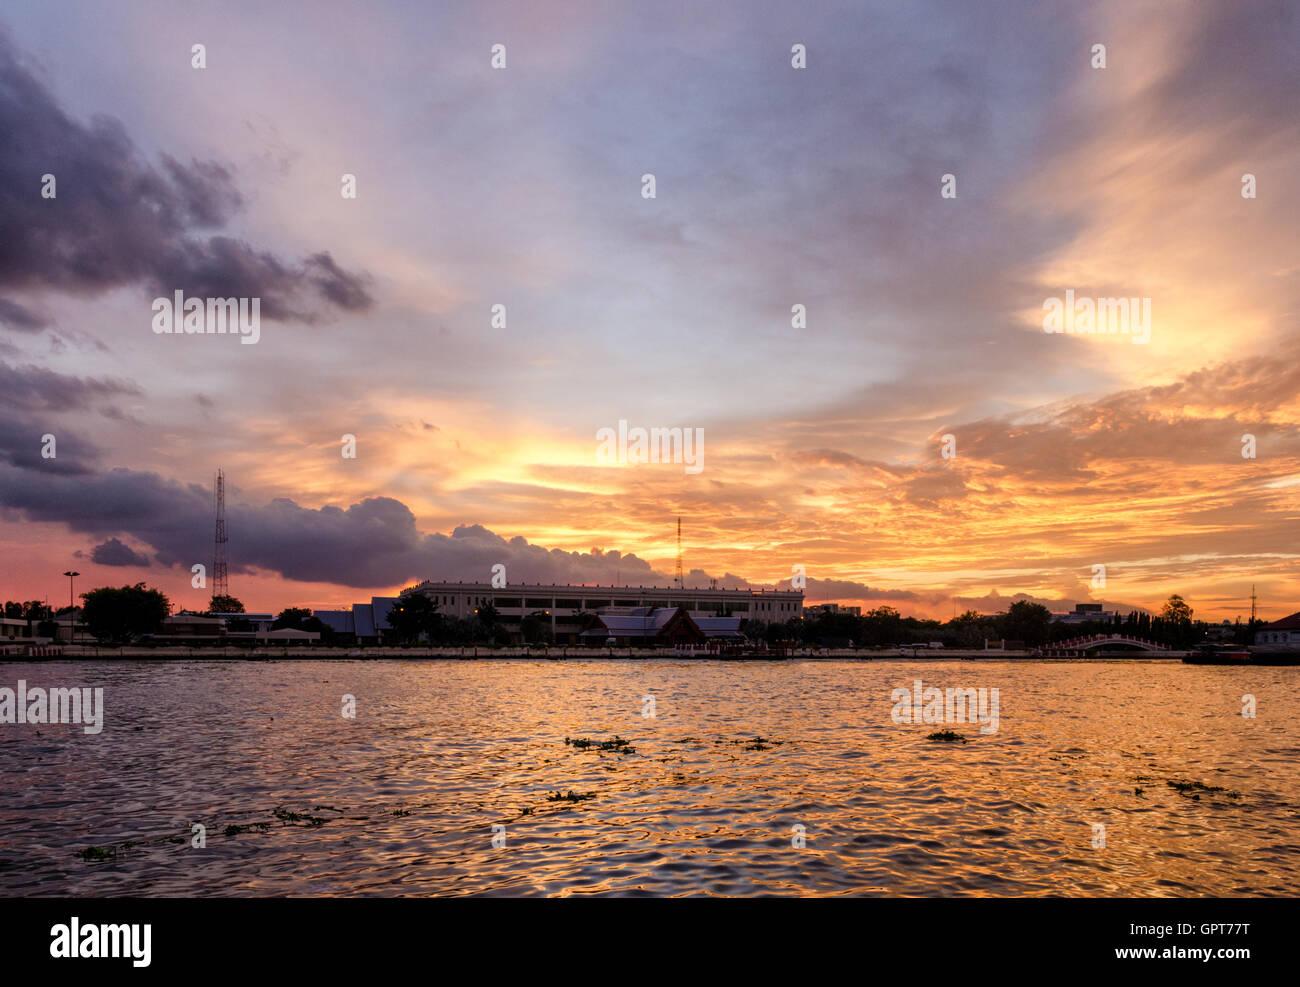 Vista panorámica de Bangkok sobre el río Chao Phraya al atardecer Foto de stock